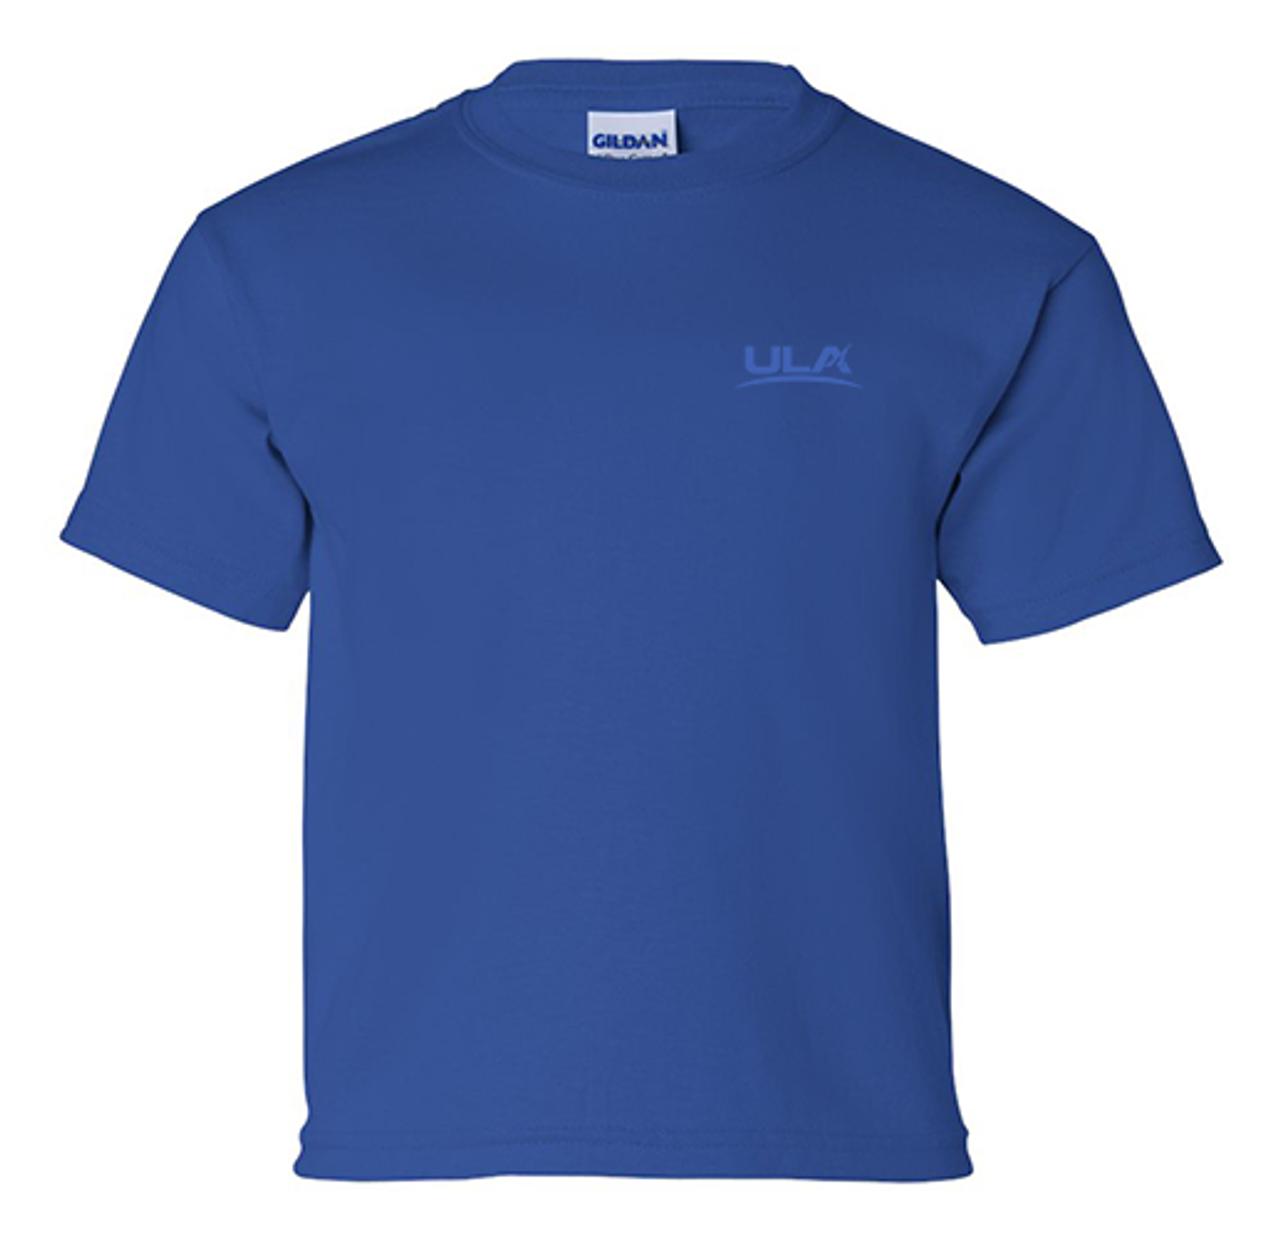 95f834ca Gildan Ultra Cotton Youth T-Shirt - United Launch Alliance